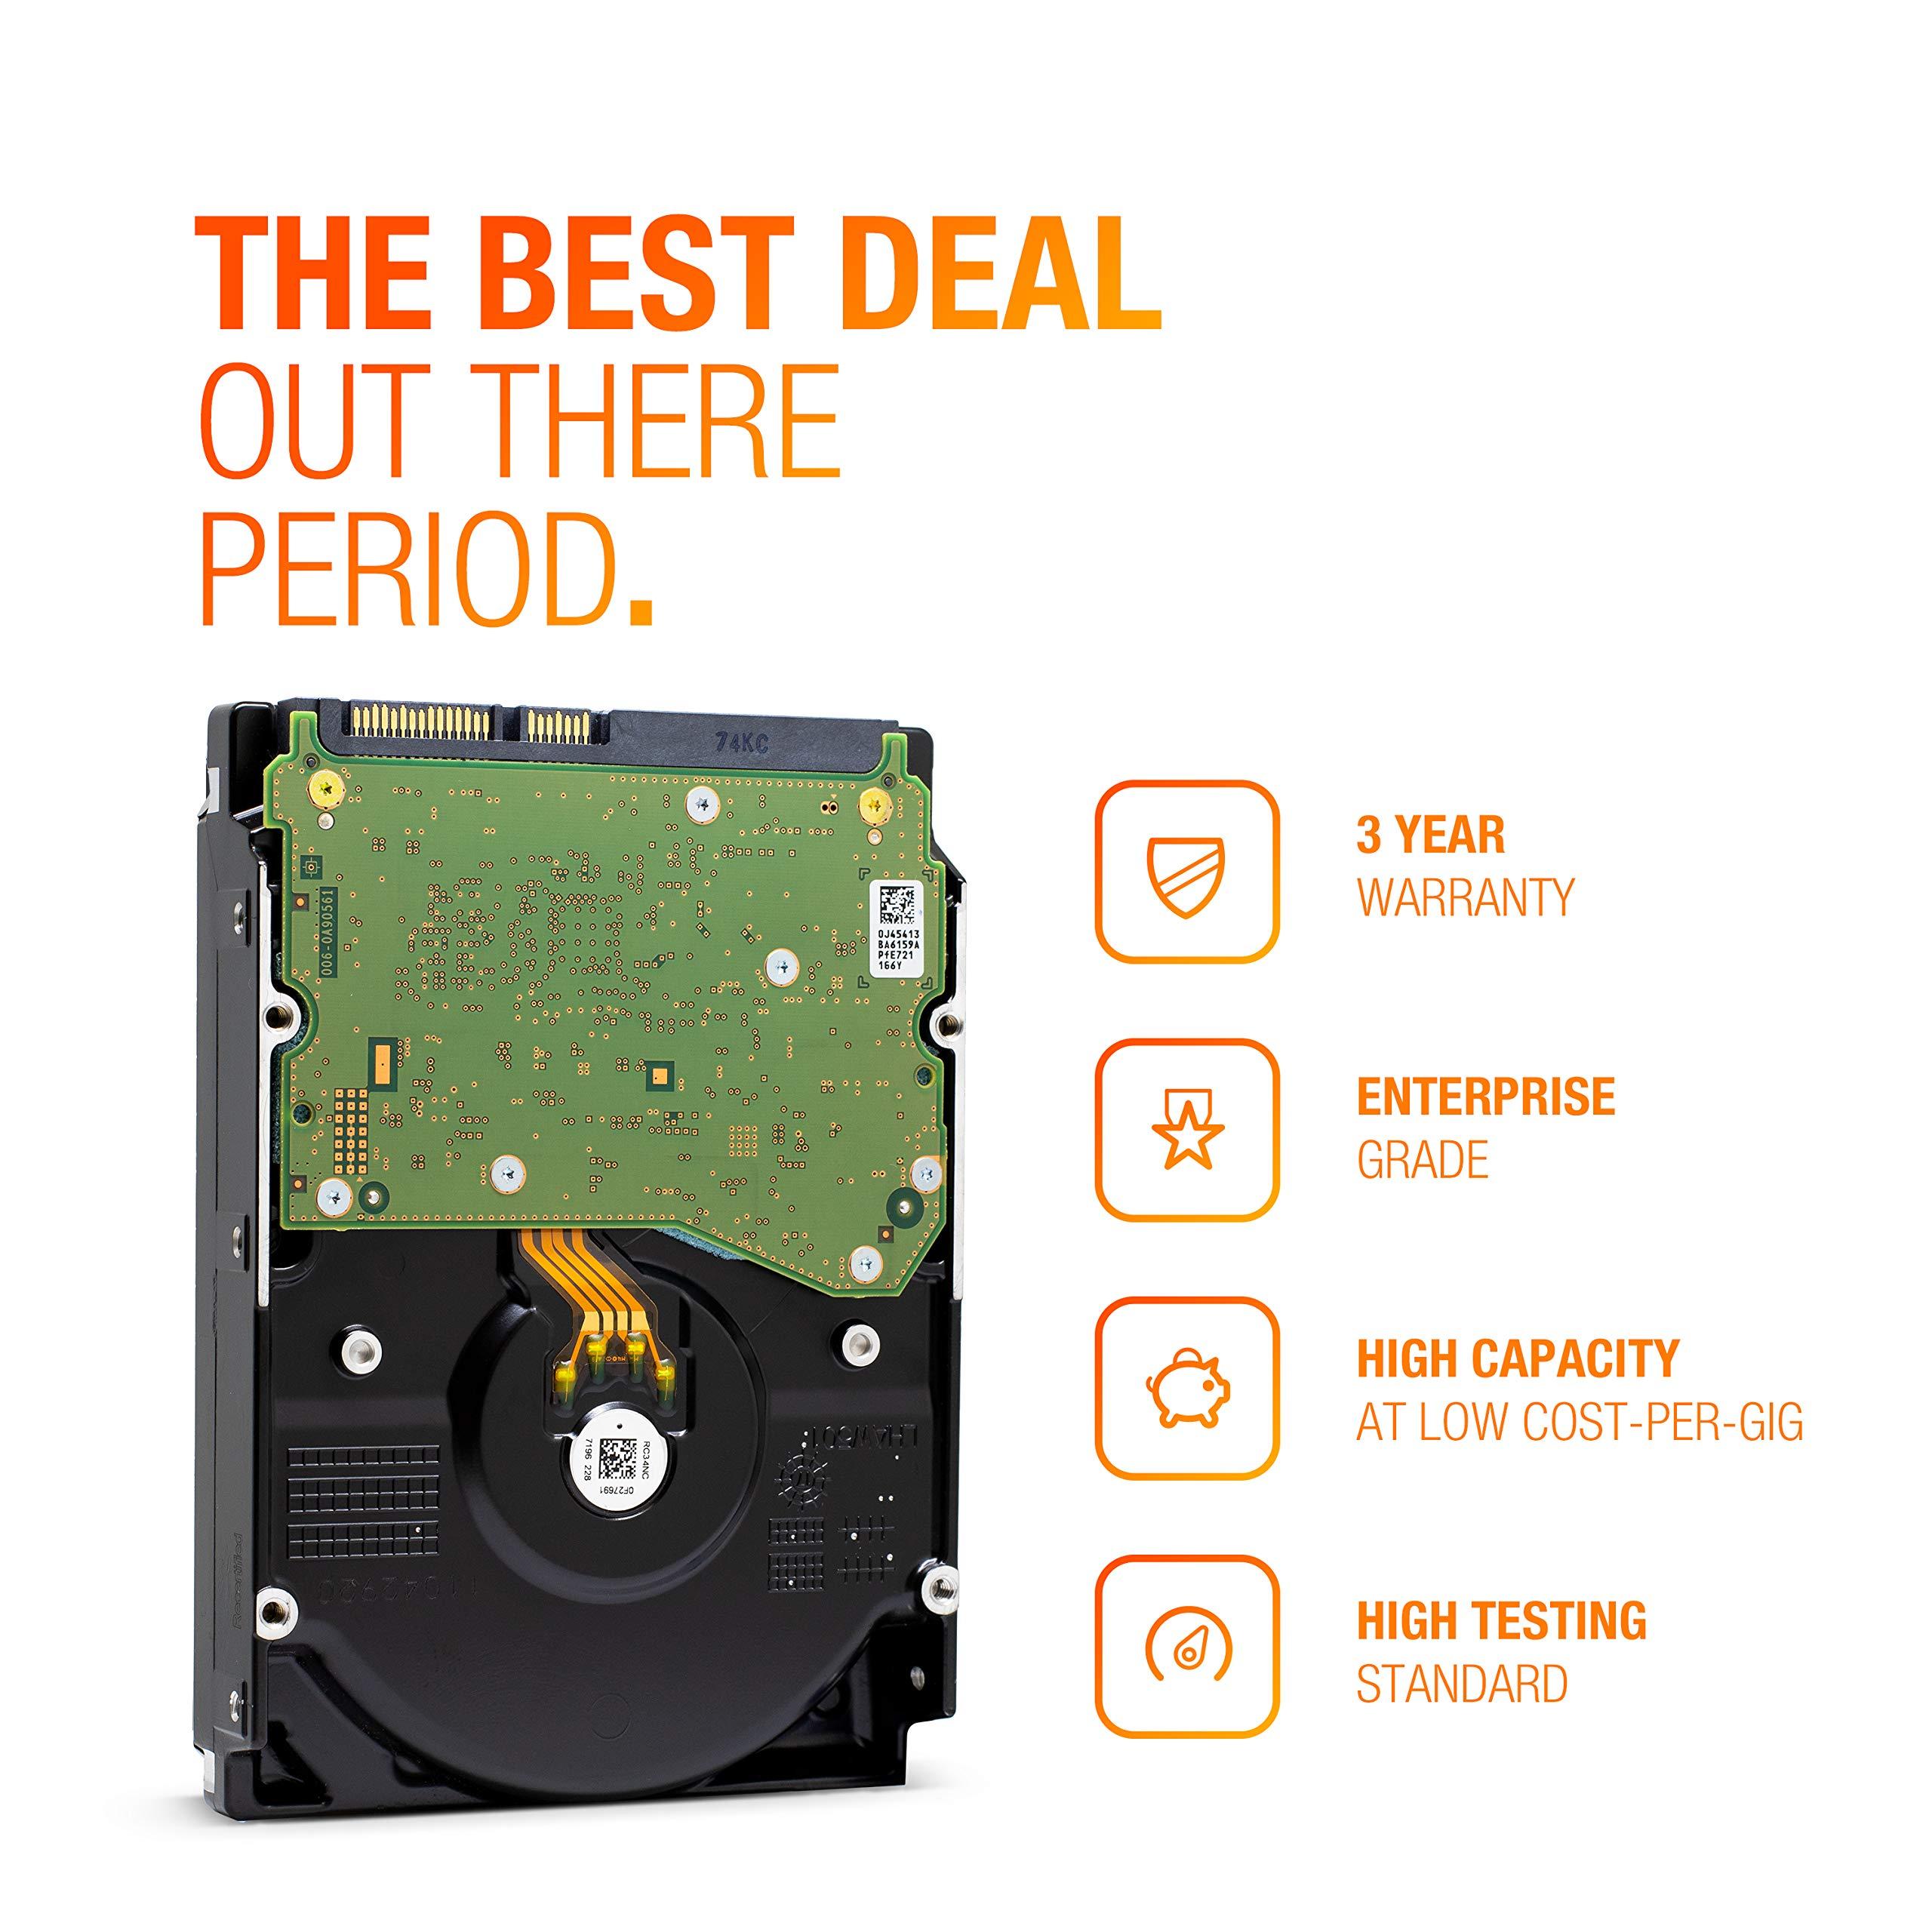 HGST Ultrastar He10 | HUH721010ALE600| 0F27452 | 512e | 10TB SATA 6.0Gb/s 7200 RPM 256MB Cache 3.5in | Enterprise Hard Drive HDD,  (Renewed) by HGST (Image #7)